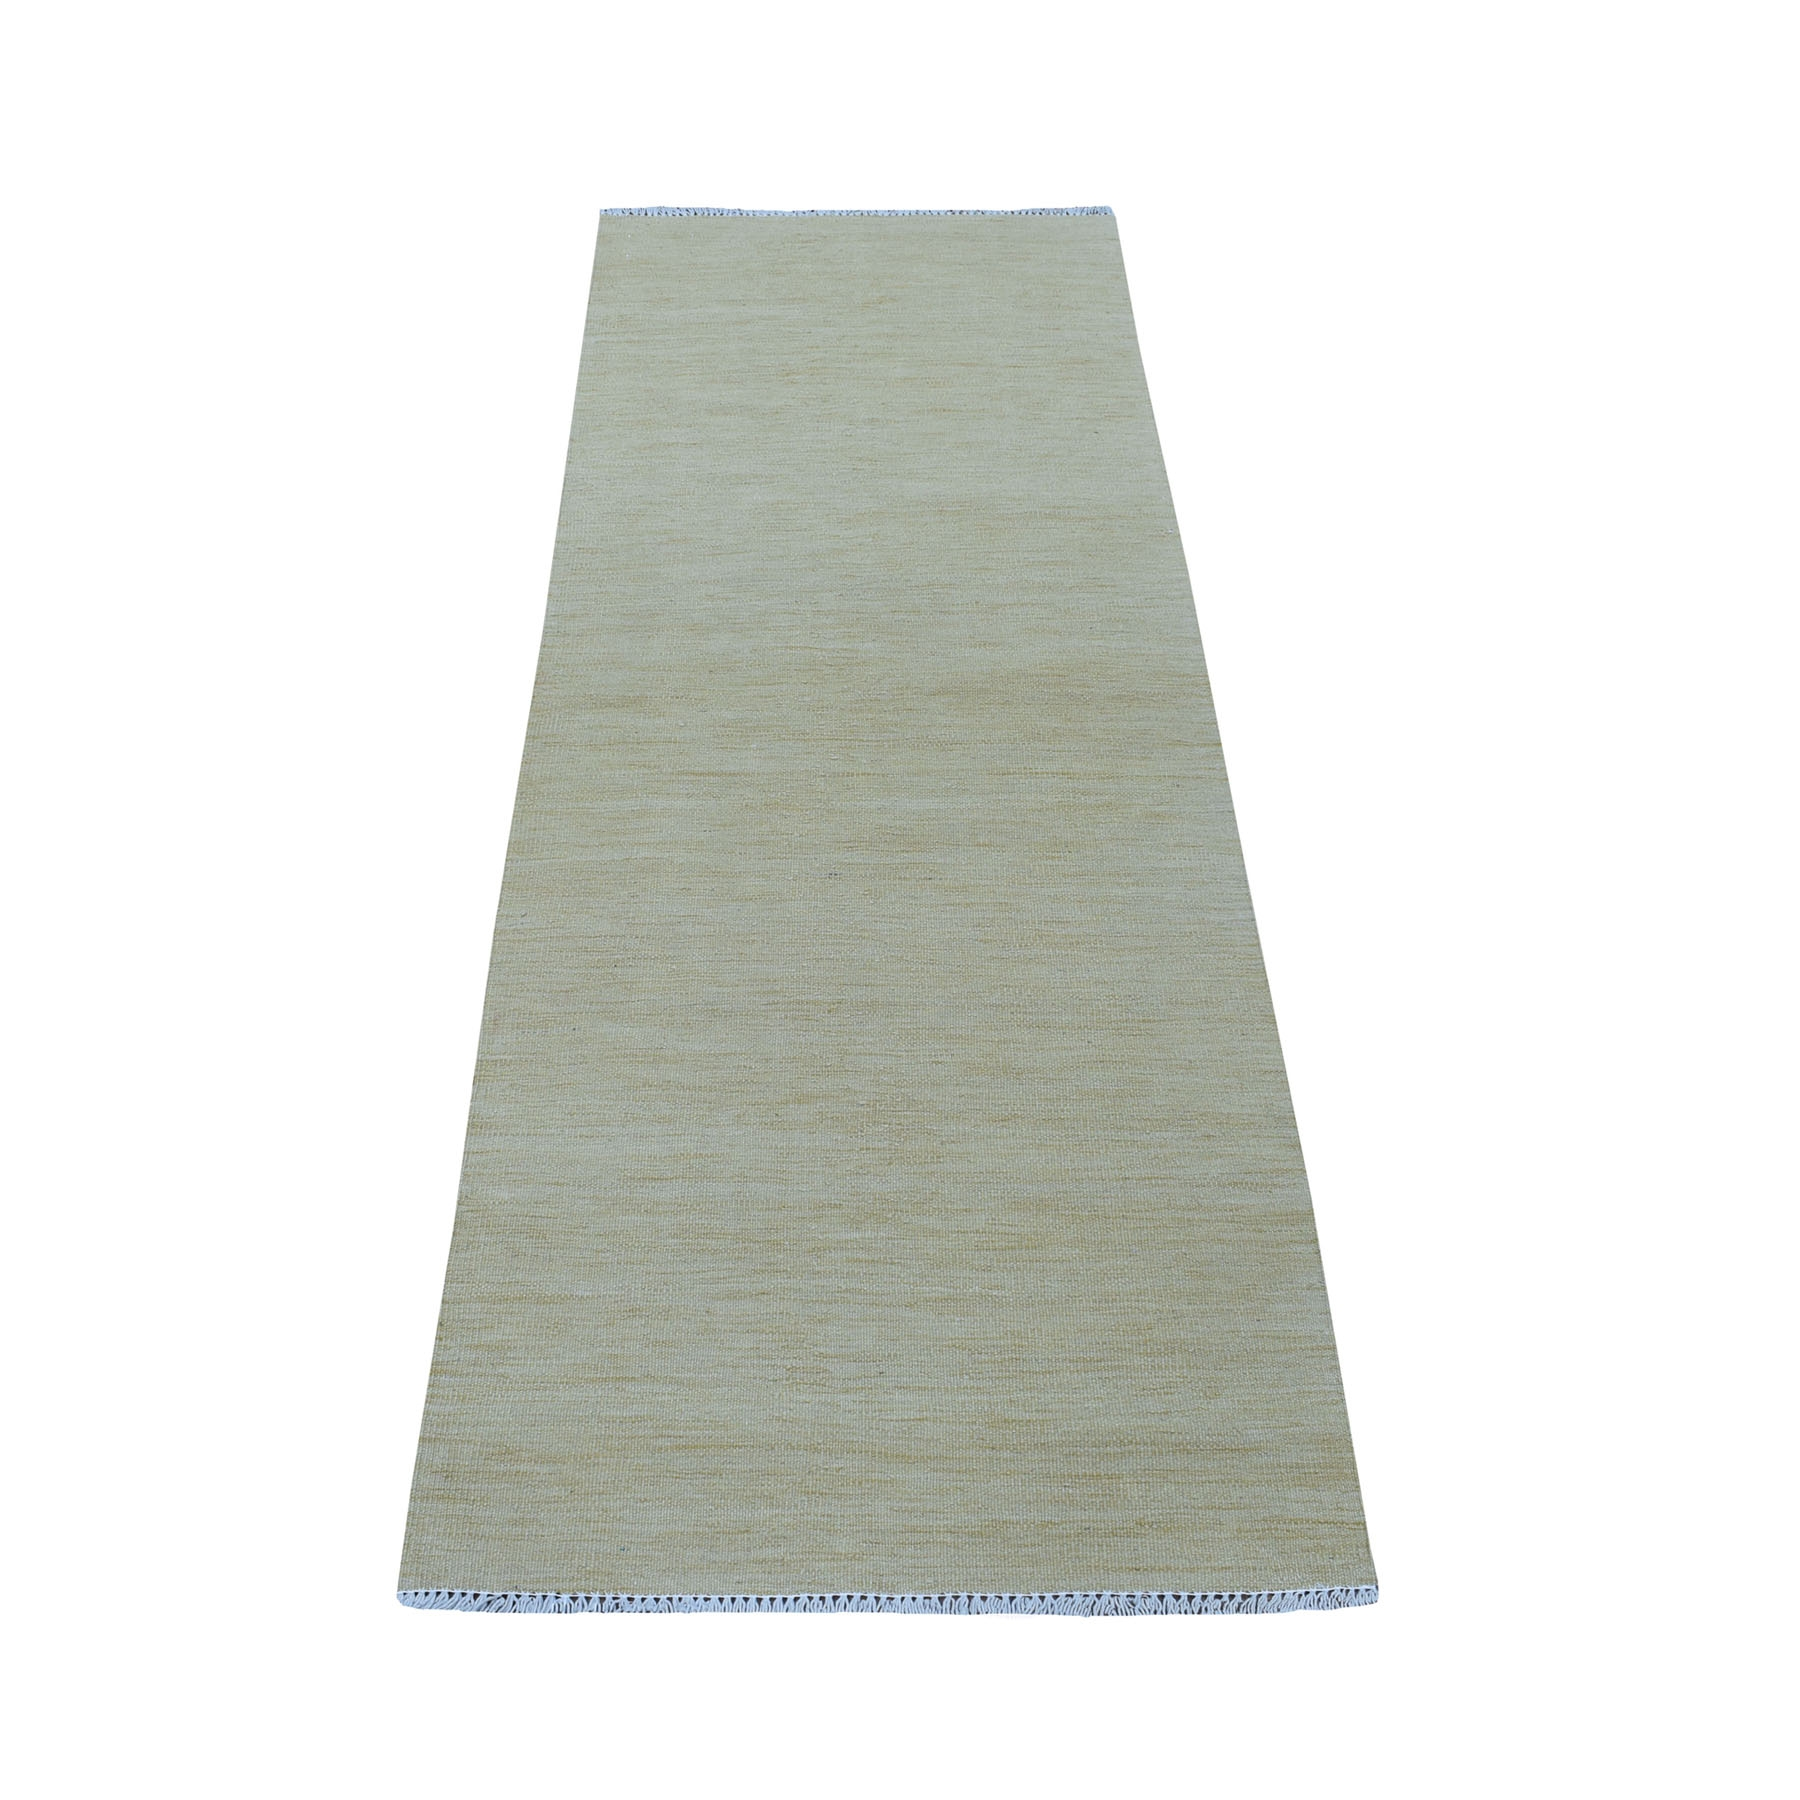 "2'5""X6'3"" Beige Shades Flat Weave Kilim Pure Wool Hand Woven Runner Rug moaec8e8"